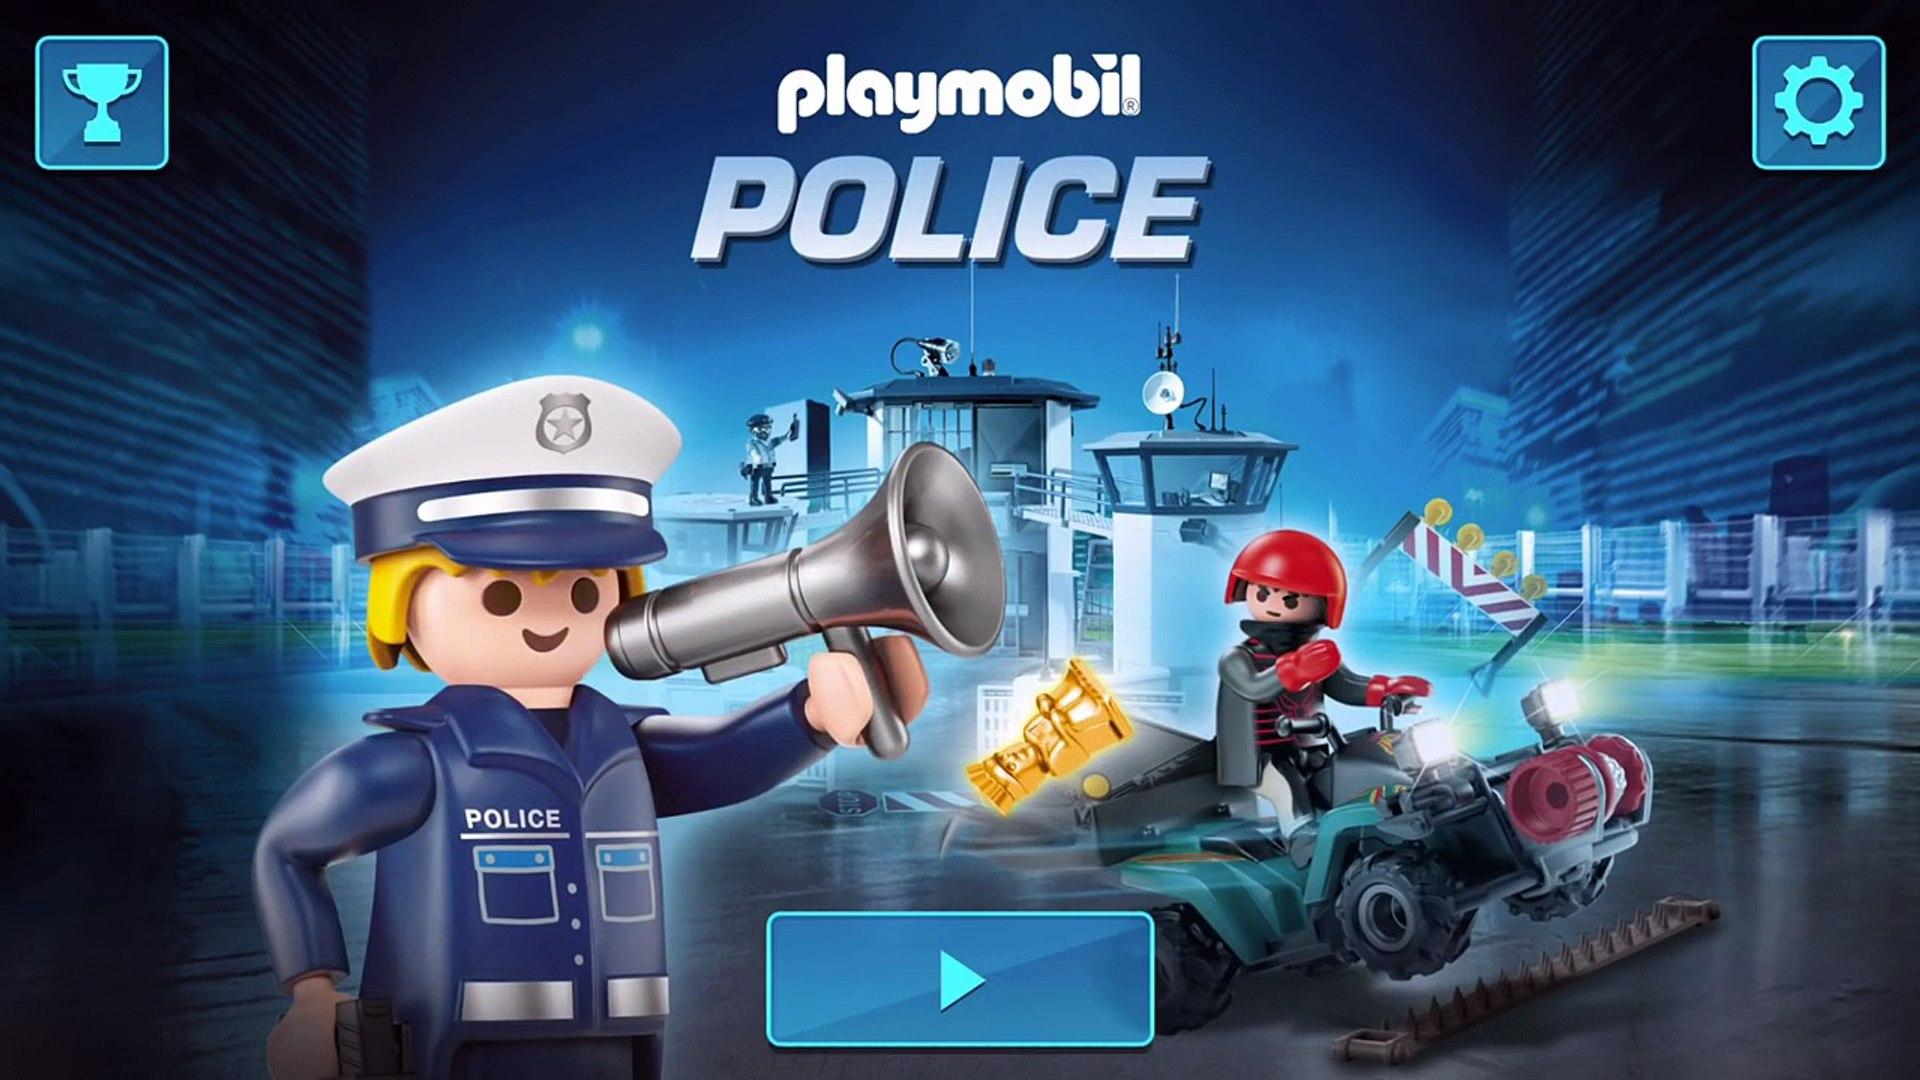 Playmobil Police Car// Police Bike// Police Helicopter// Policeman and Burglar